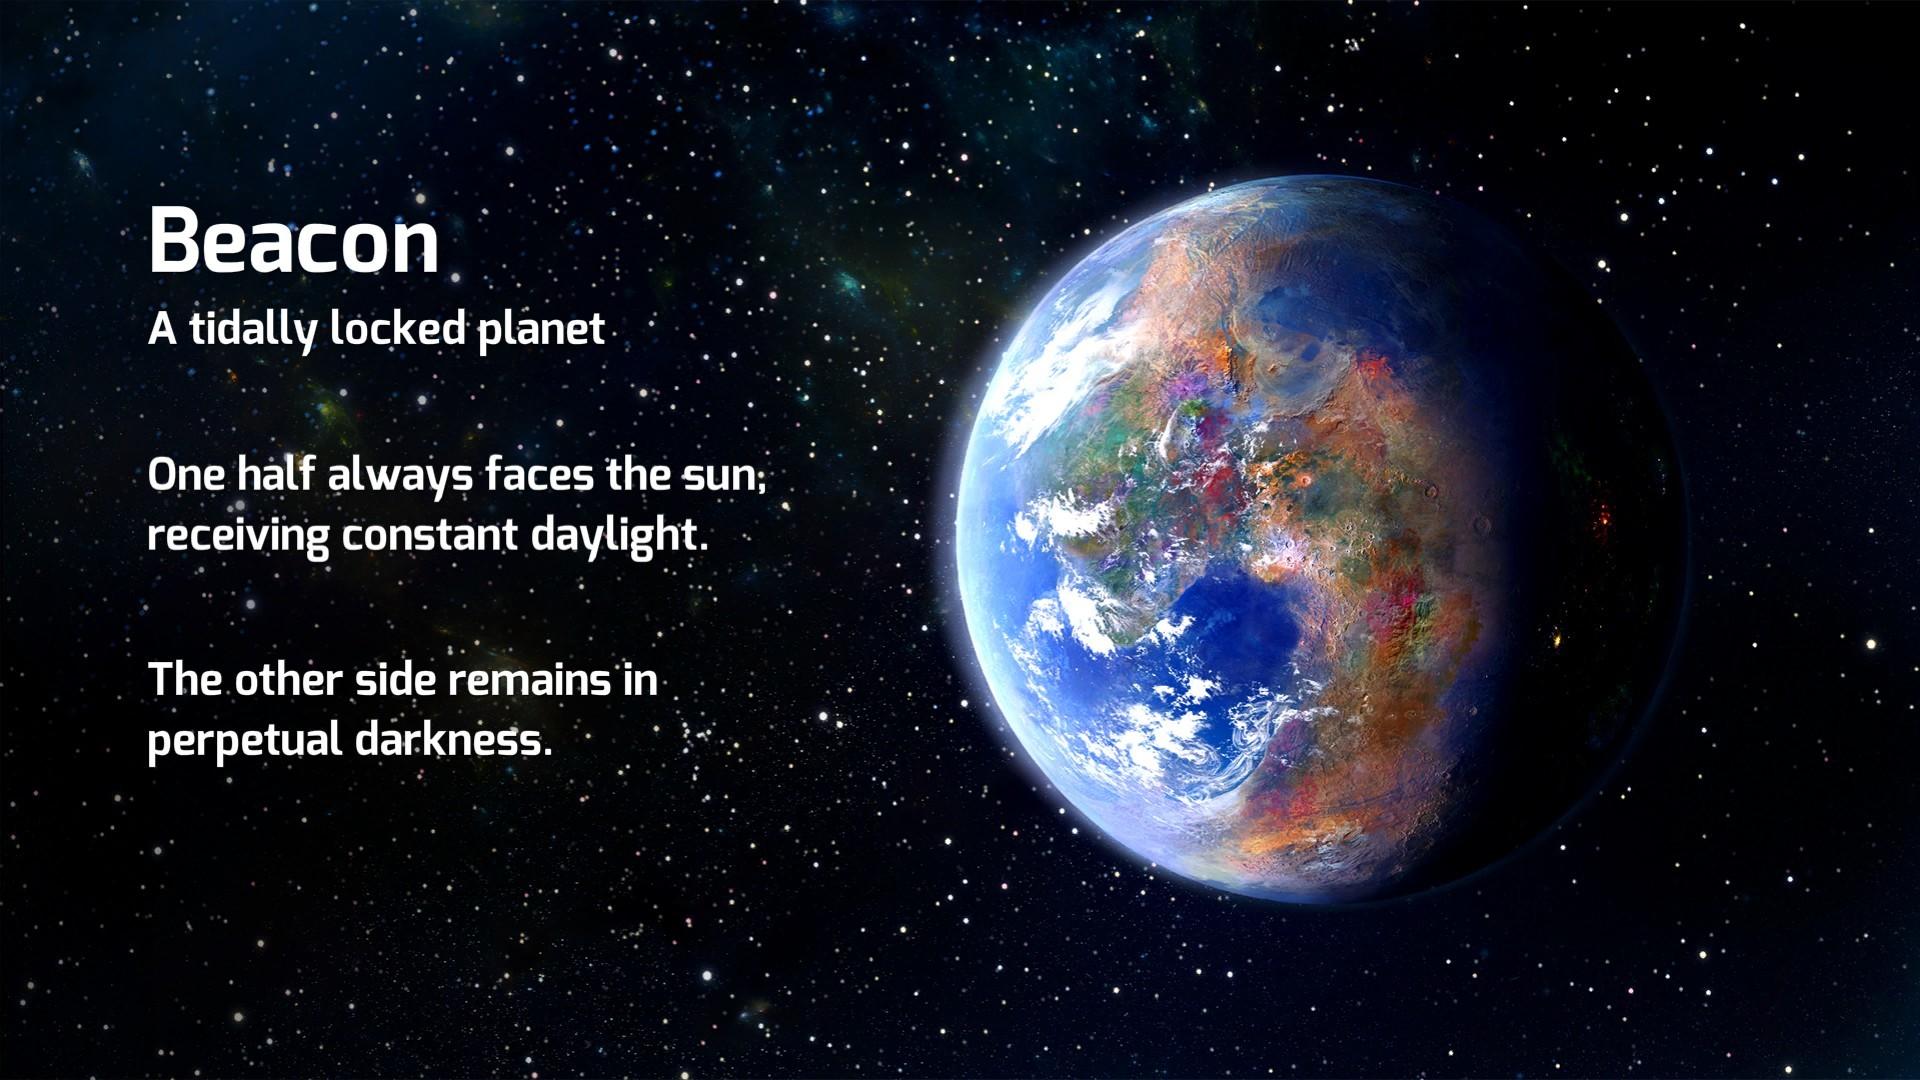 La planète Beacon